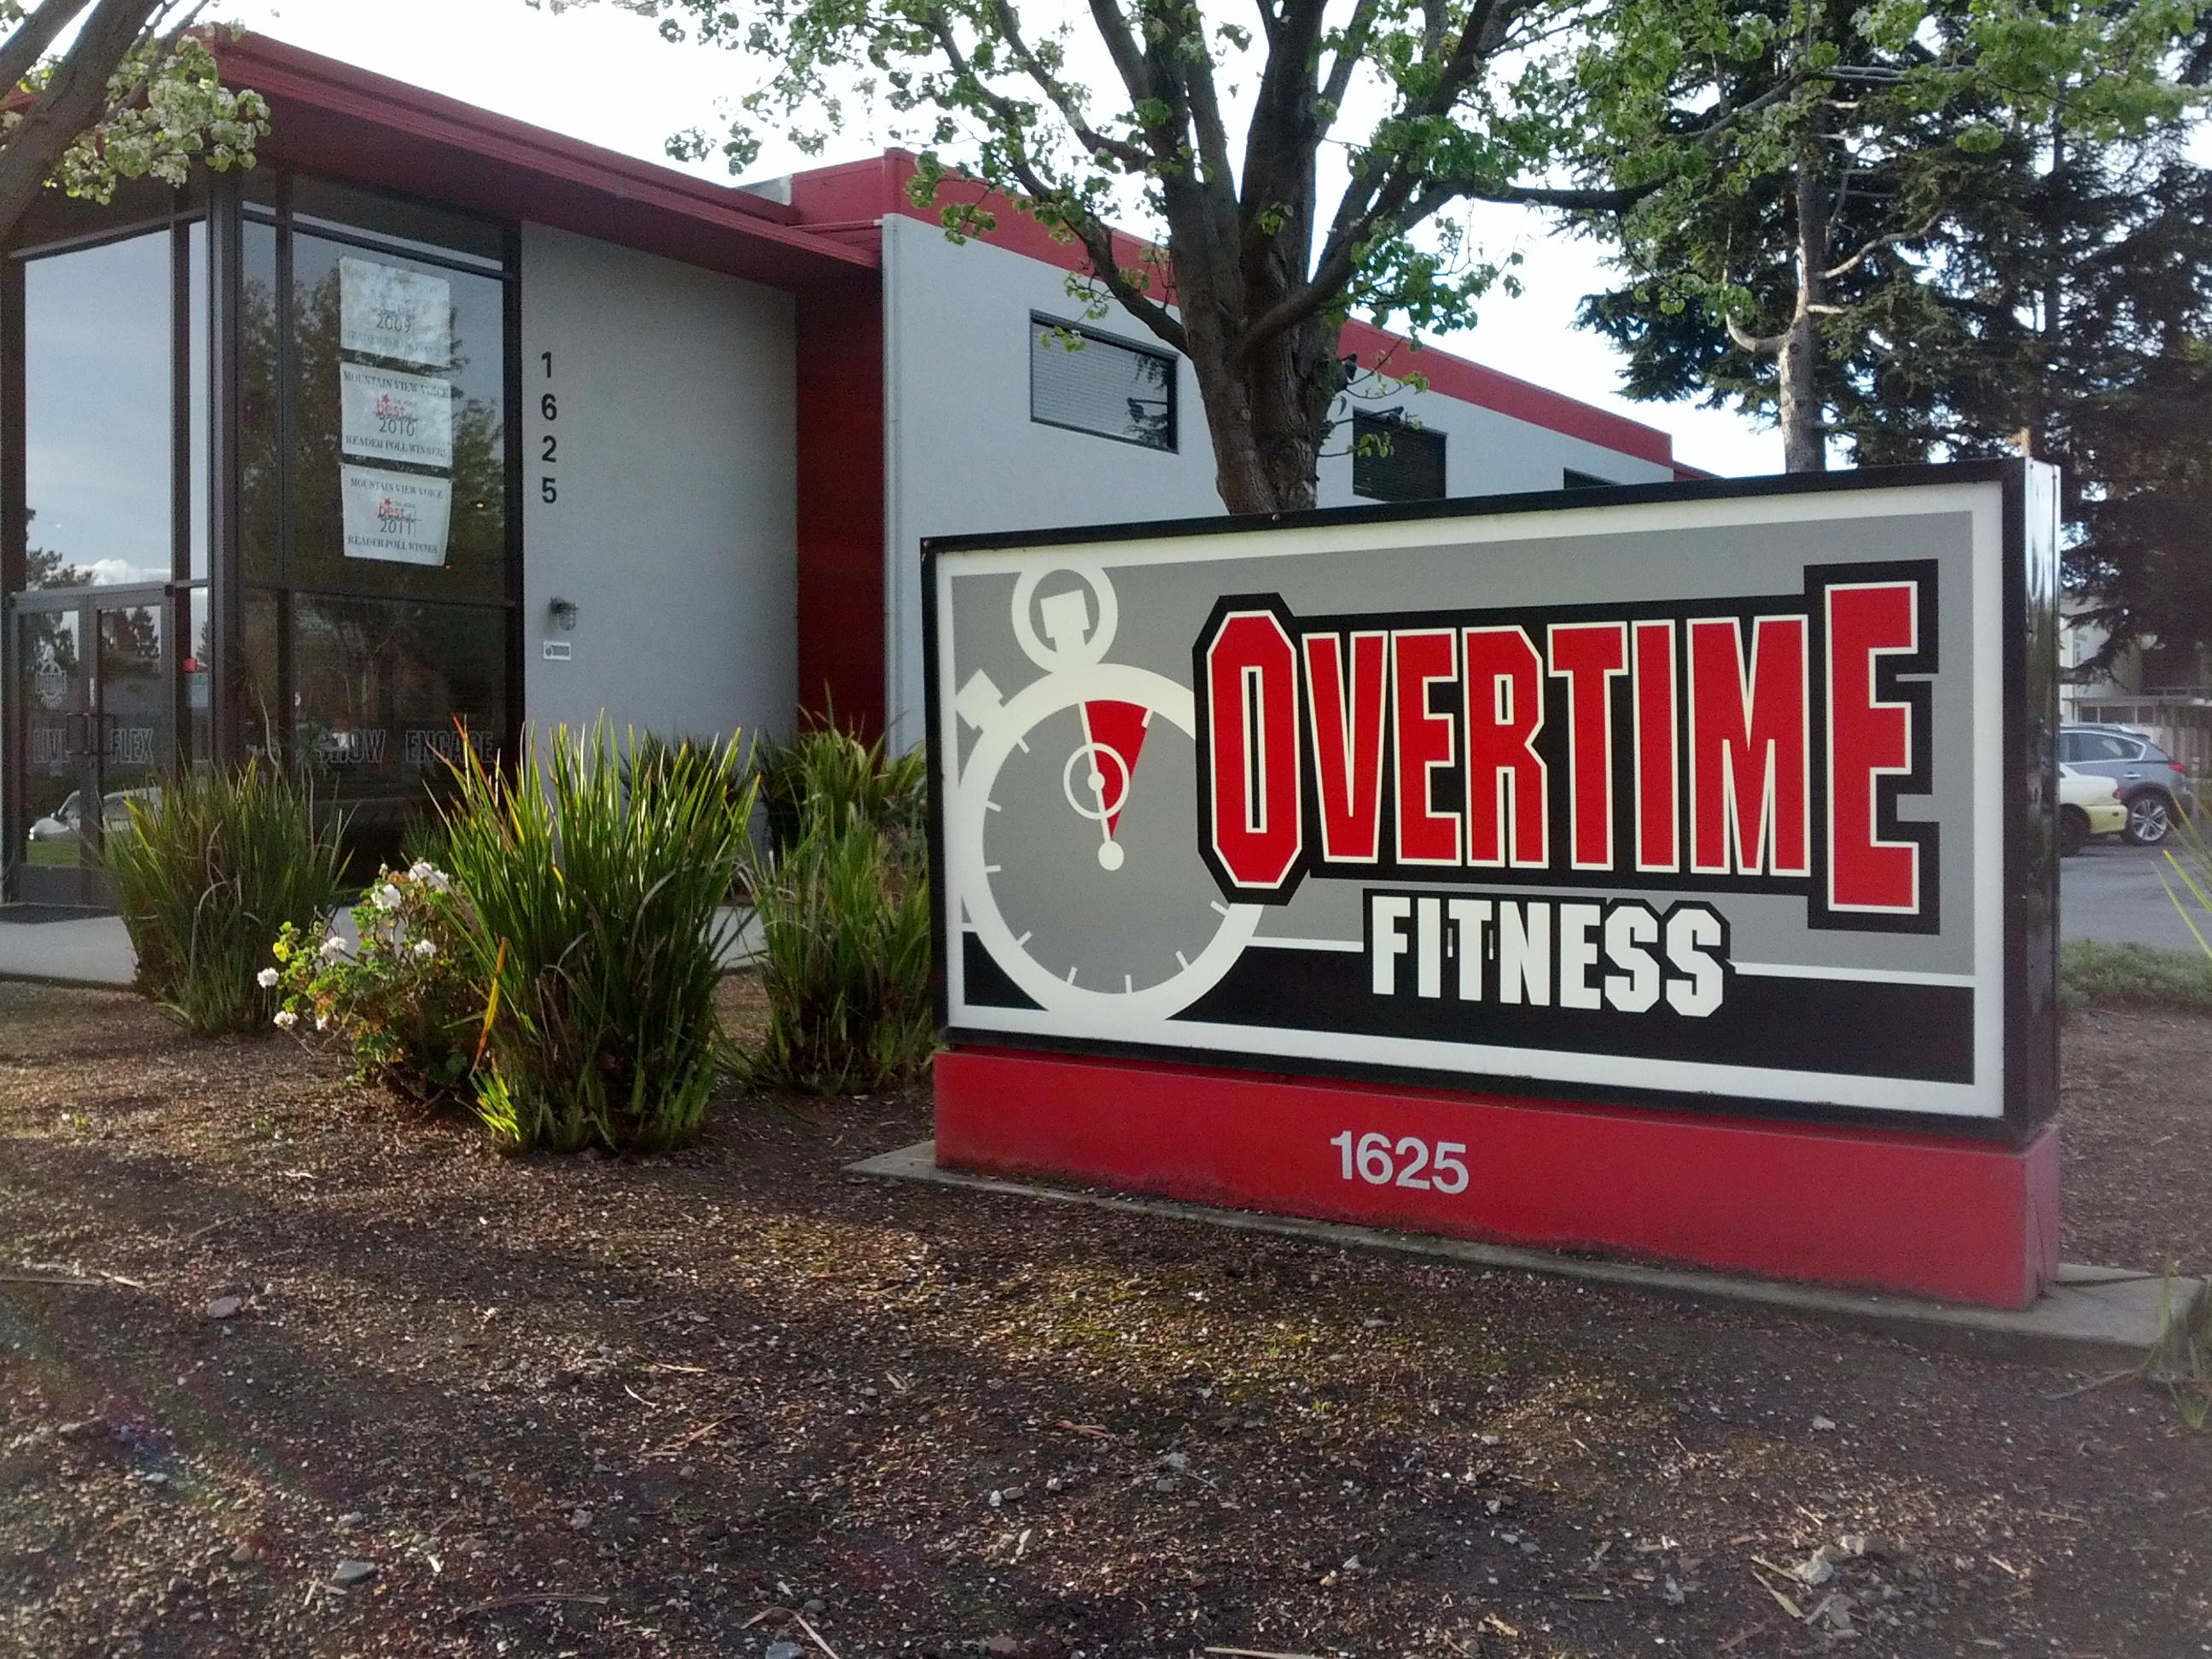 overtime-fitness-technology-innovations